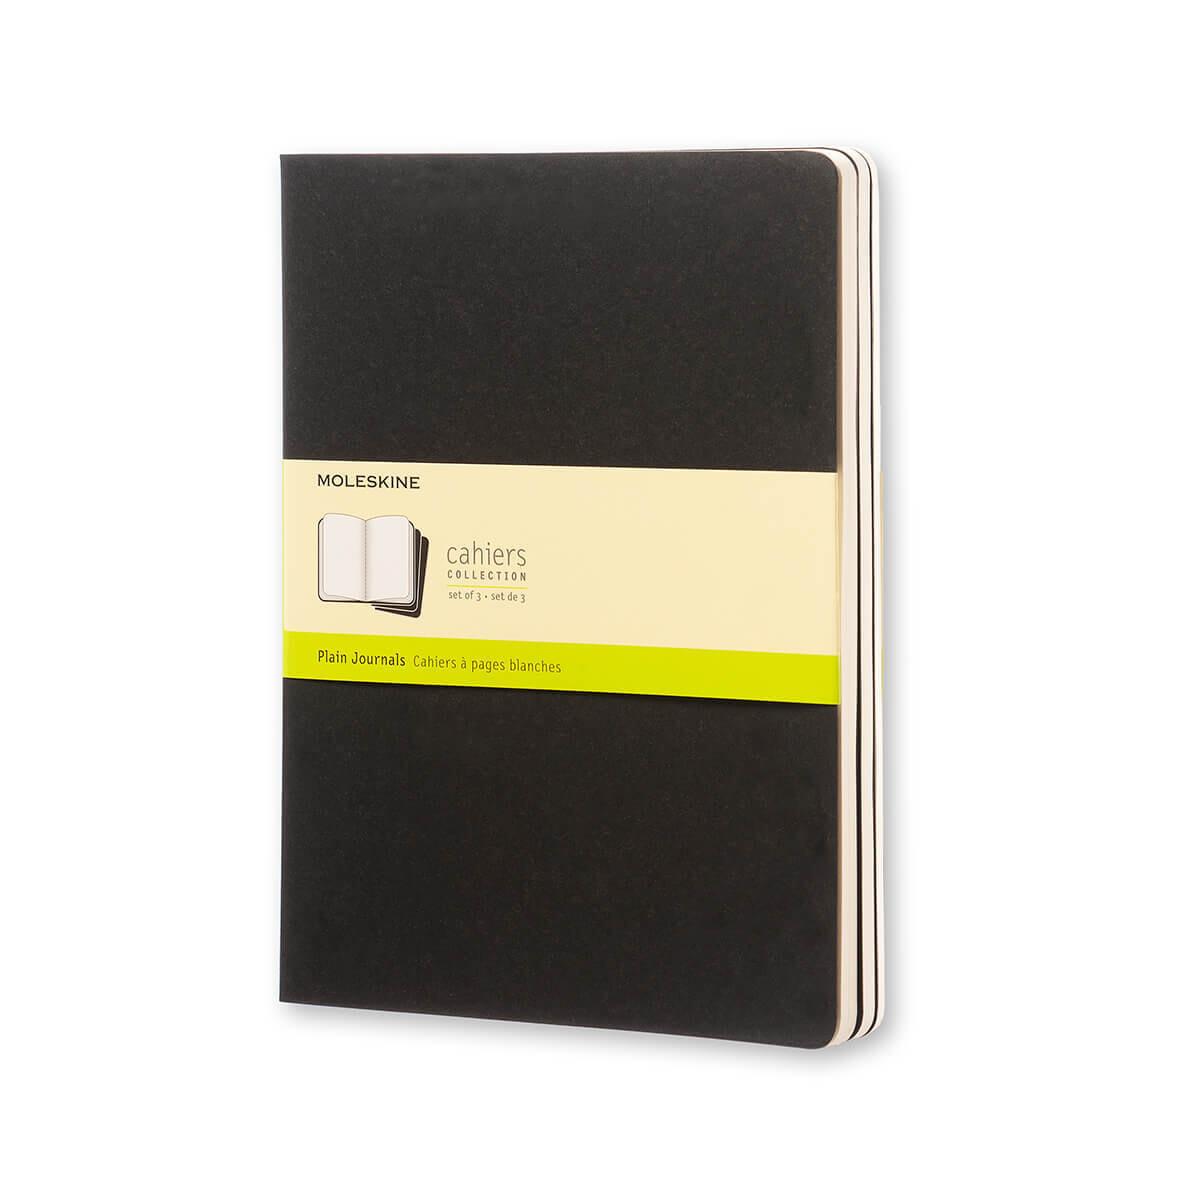 Moleskine Cahier Journals X-large X 3